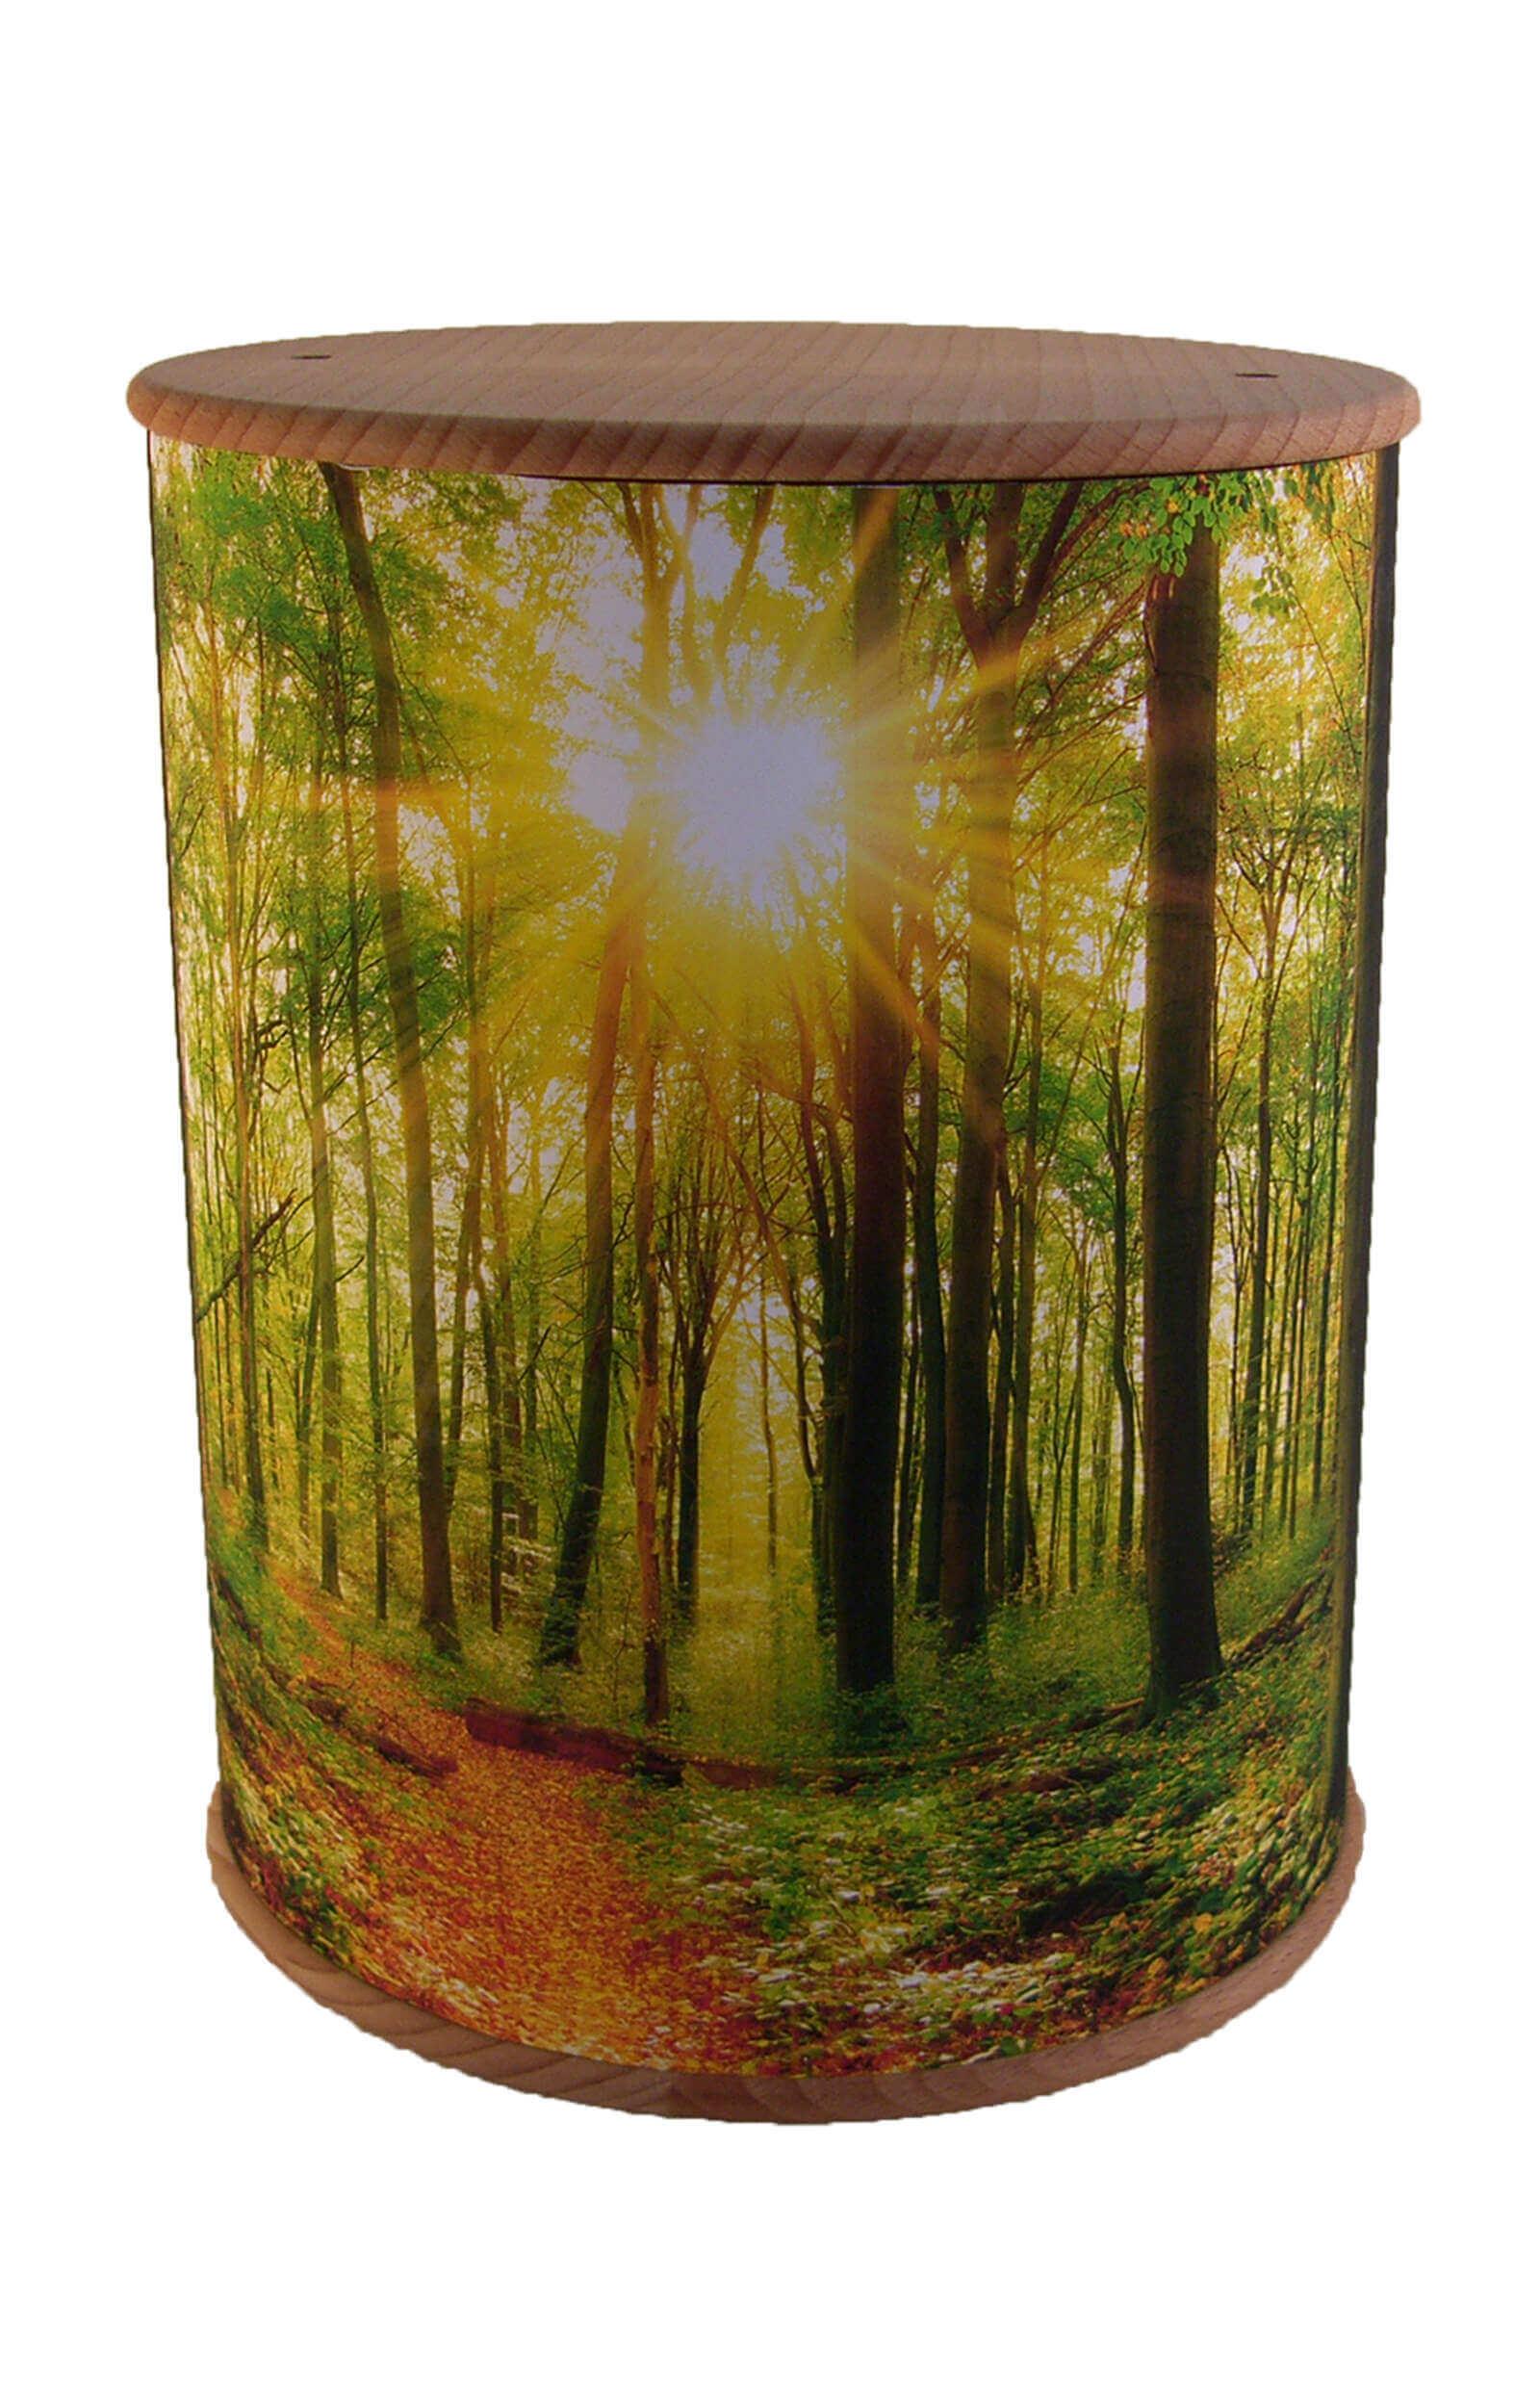 en ZB004 photo urn forest and light